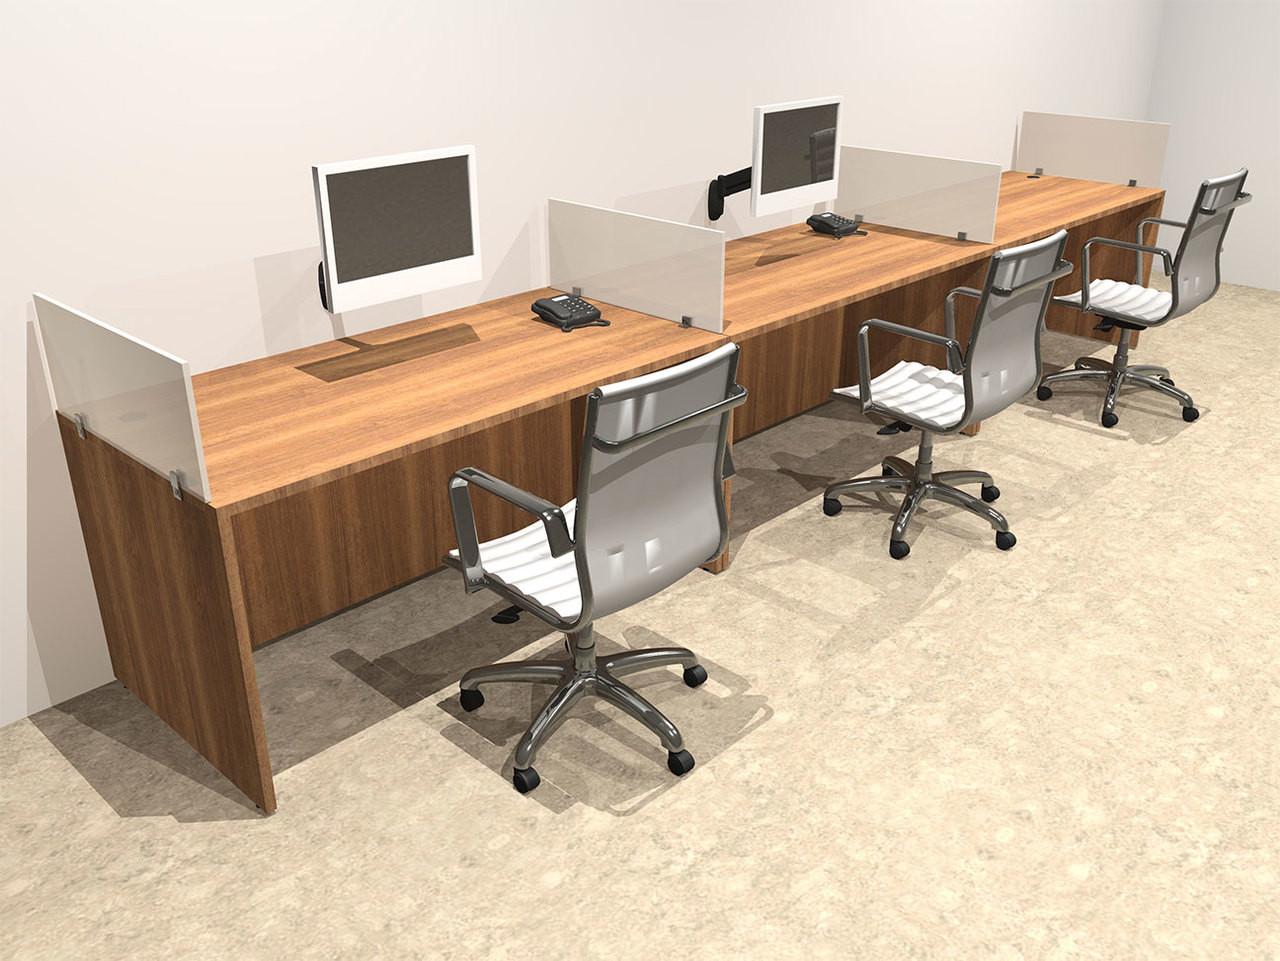 Three Person Divider Modern Office Workstation Desk Set, #OT-SUL-SP5